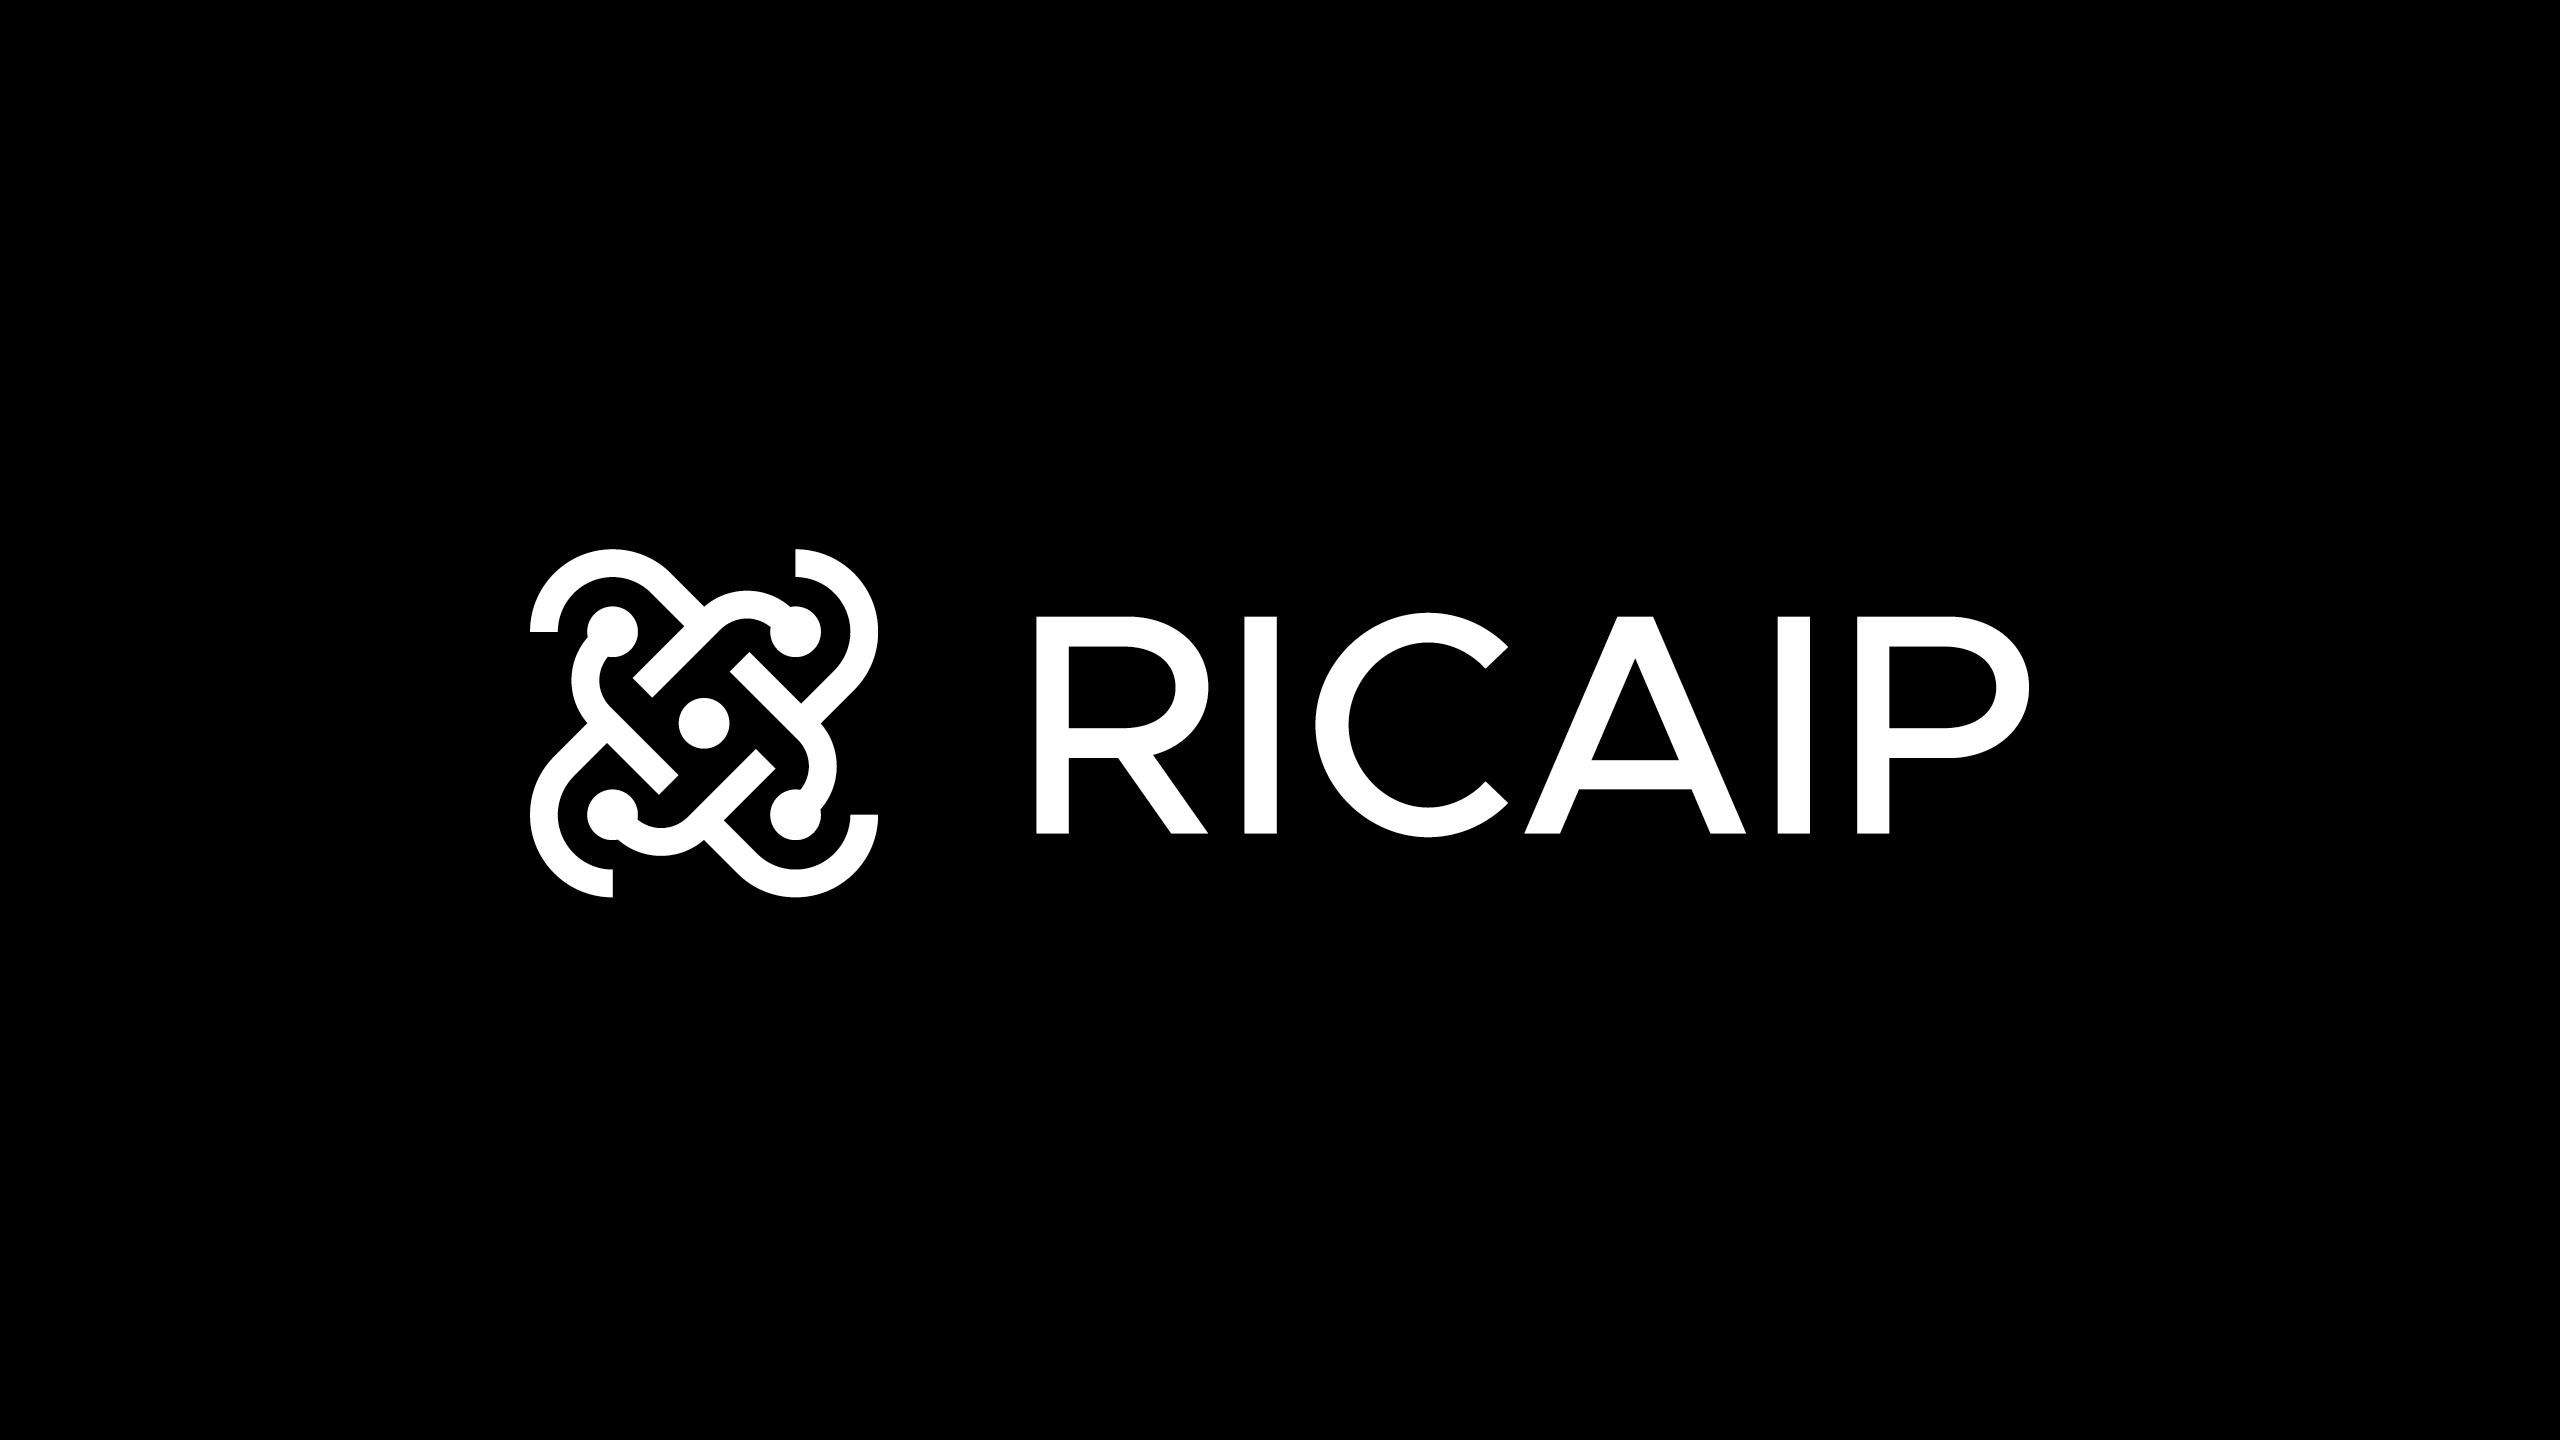 RICAIP_1